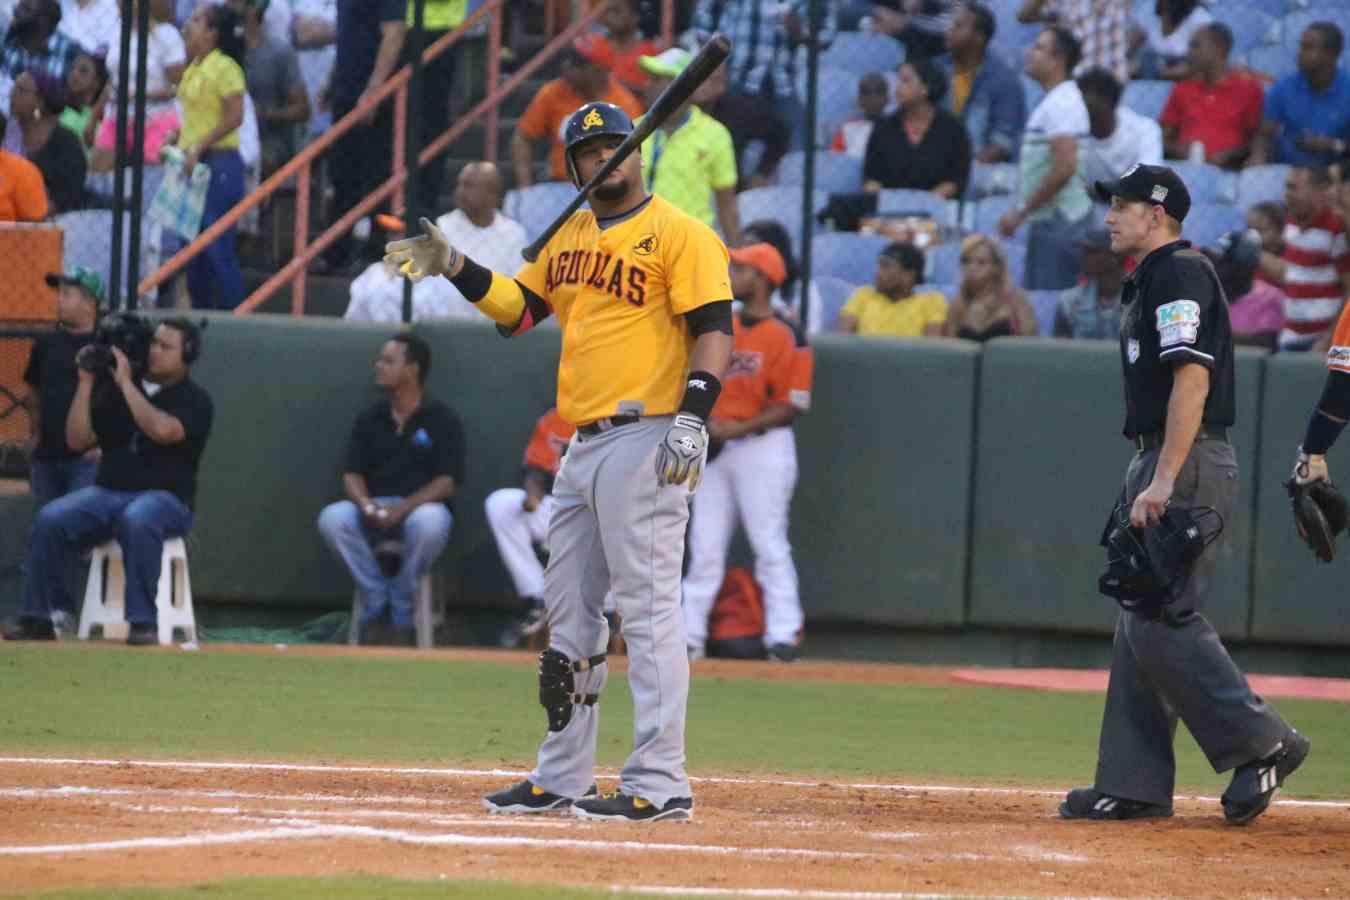 Francisco, Juan (Aguilas vs Toros, Dic 28, 2014)